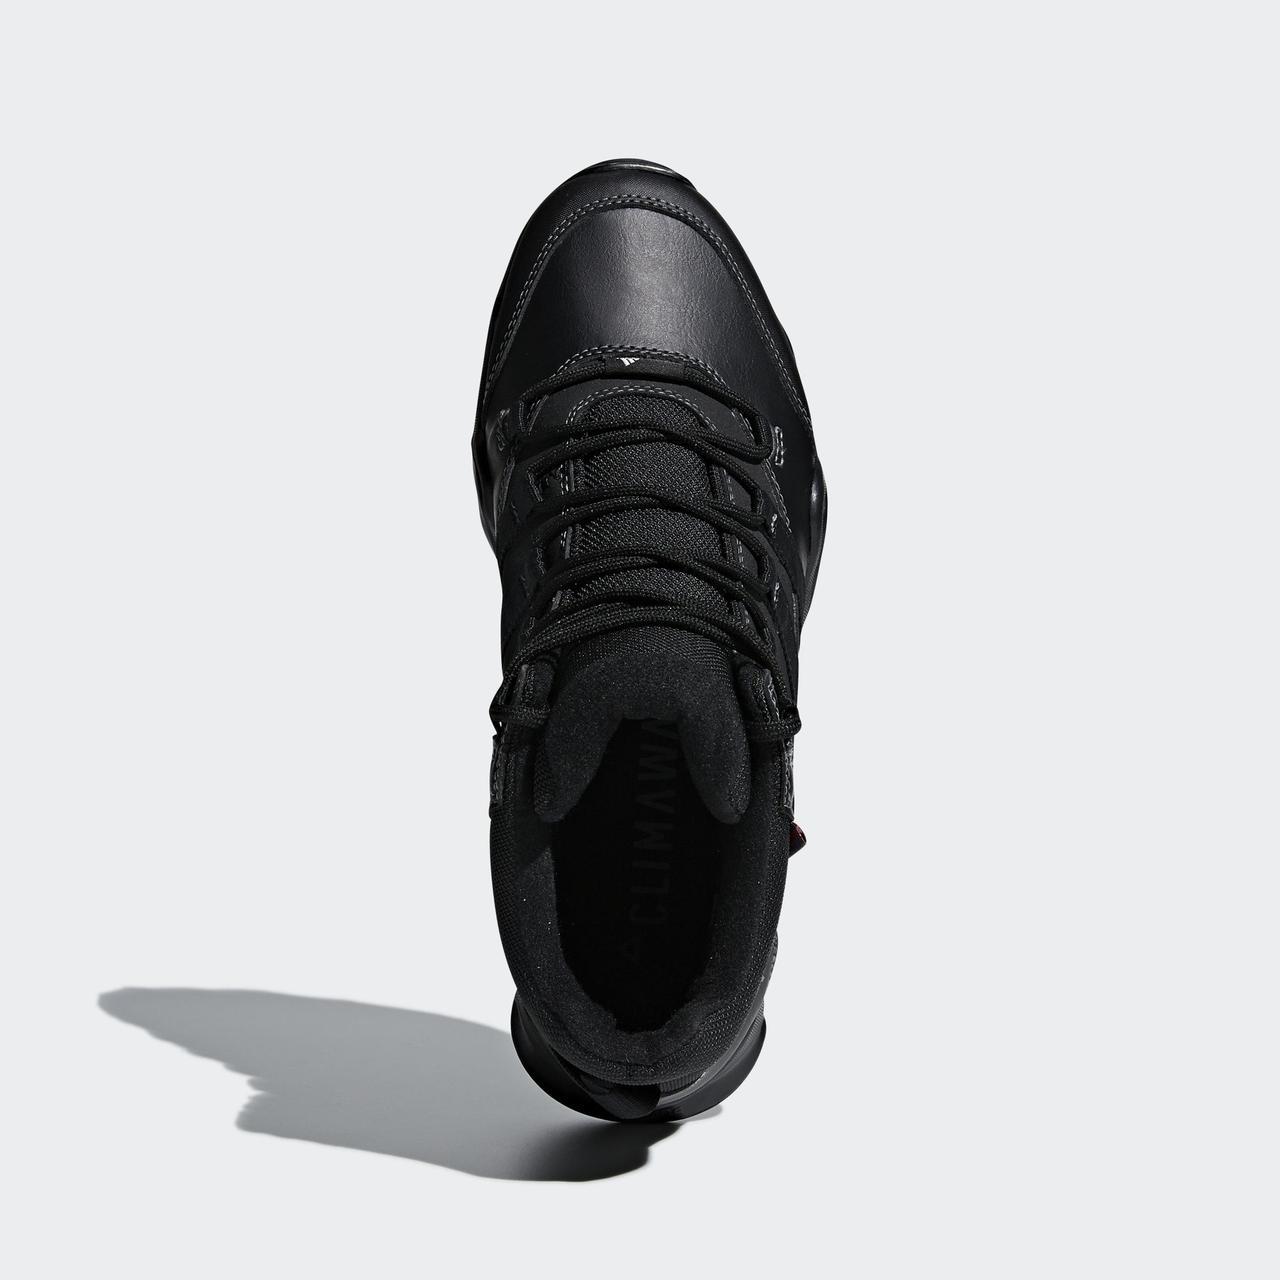 Мужские кроссовки Adidas Performance Terrex AX2R Beta Mid Climawarm  (Артикул  S80740), фото ... bb5da017658